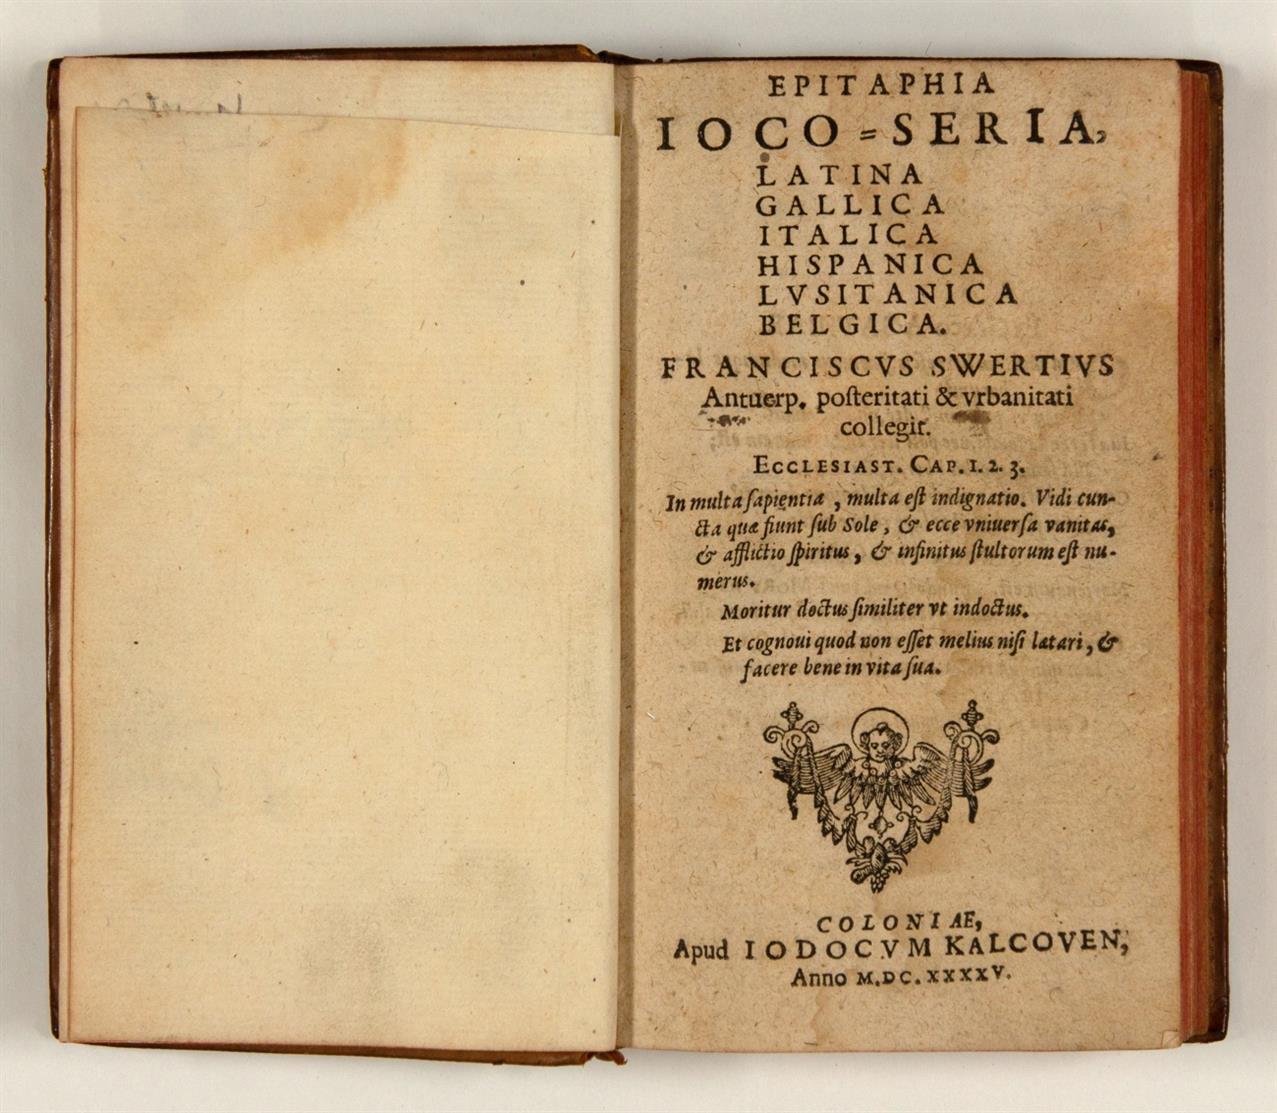 P. F. Sweerts, Epitaphia ioco-seria ... Köln, J. Kalckhoven, 1645.